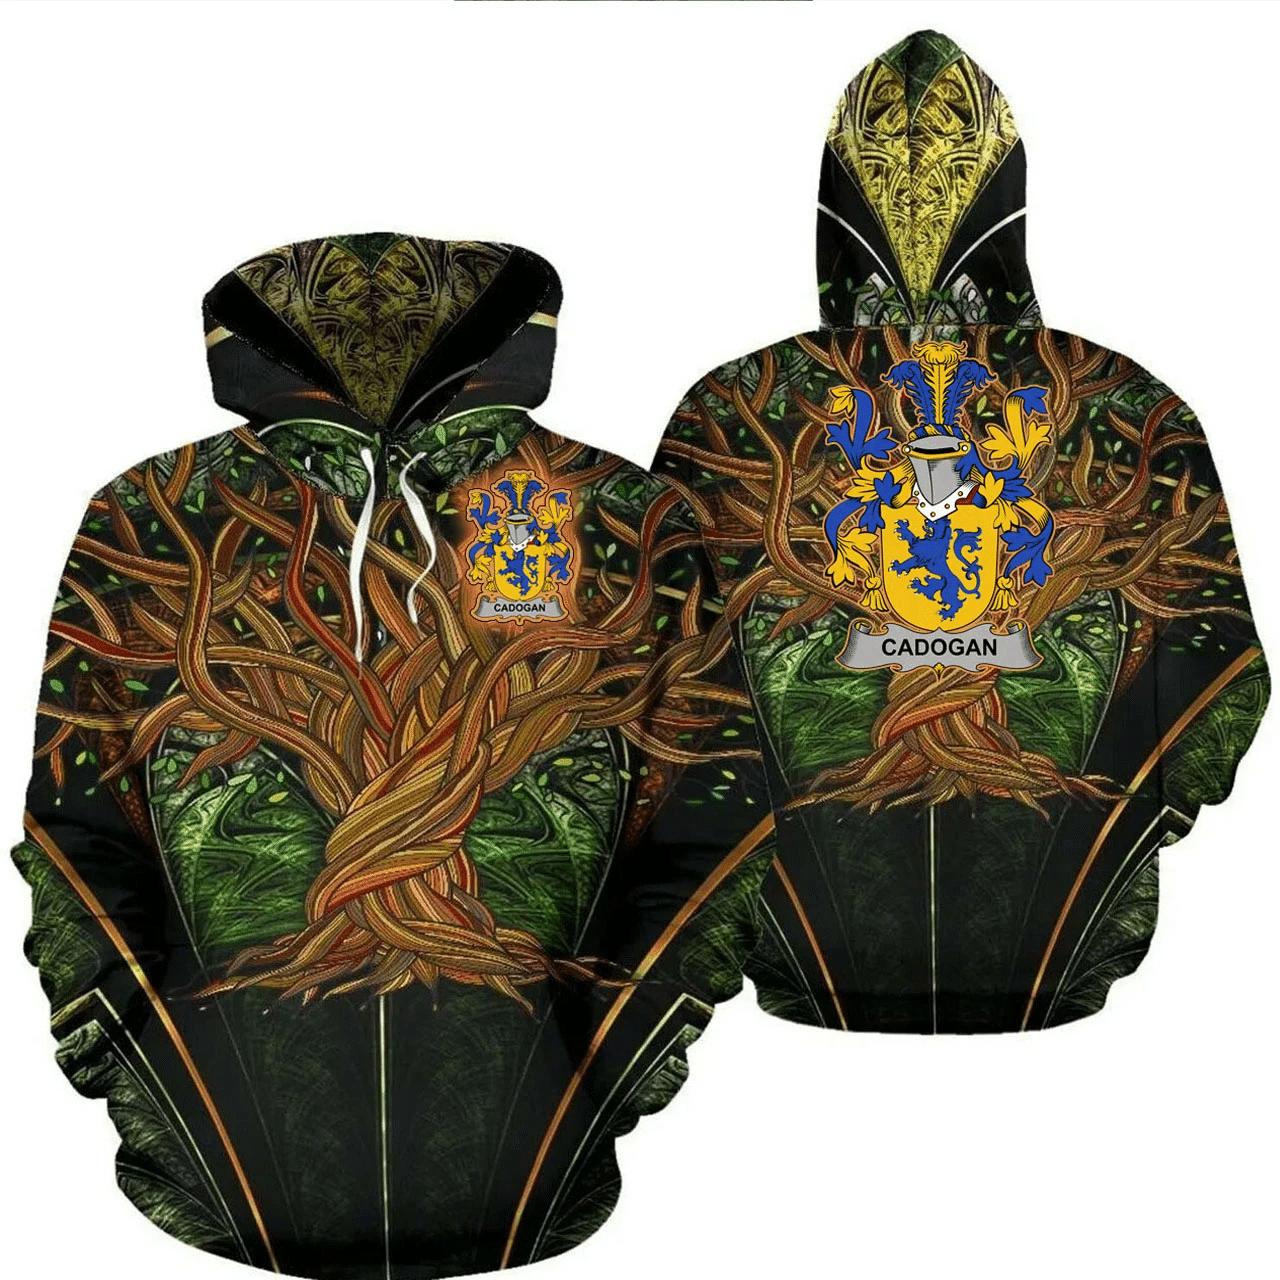 1stIreland Ireland Hoodie - Cadogan Irish Family Crest Hoodie - Tree Of Life A7